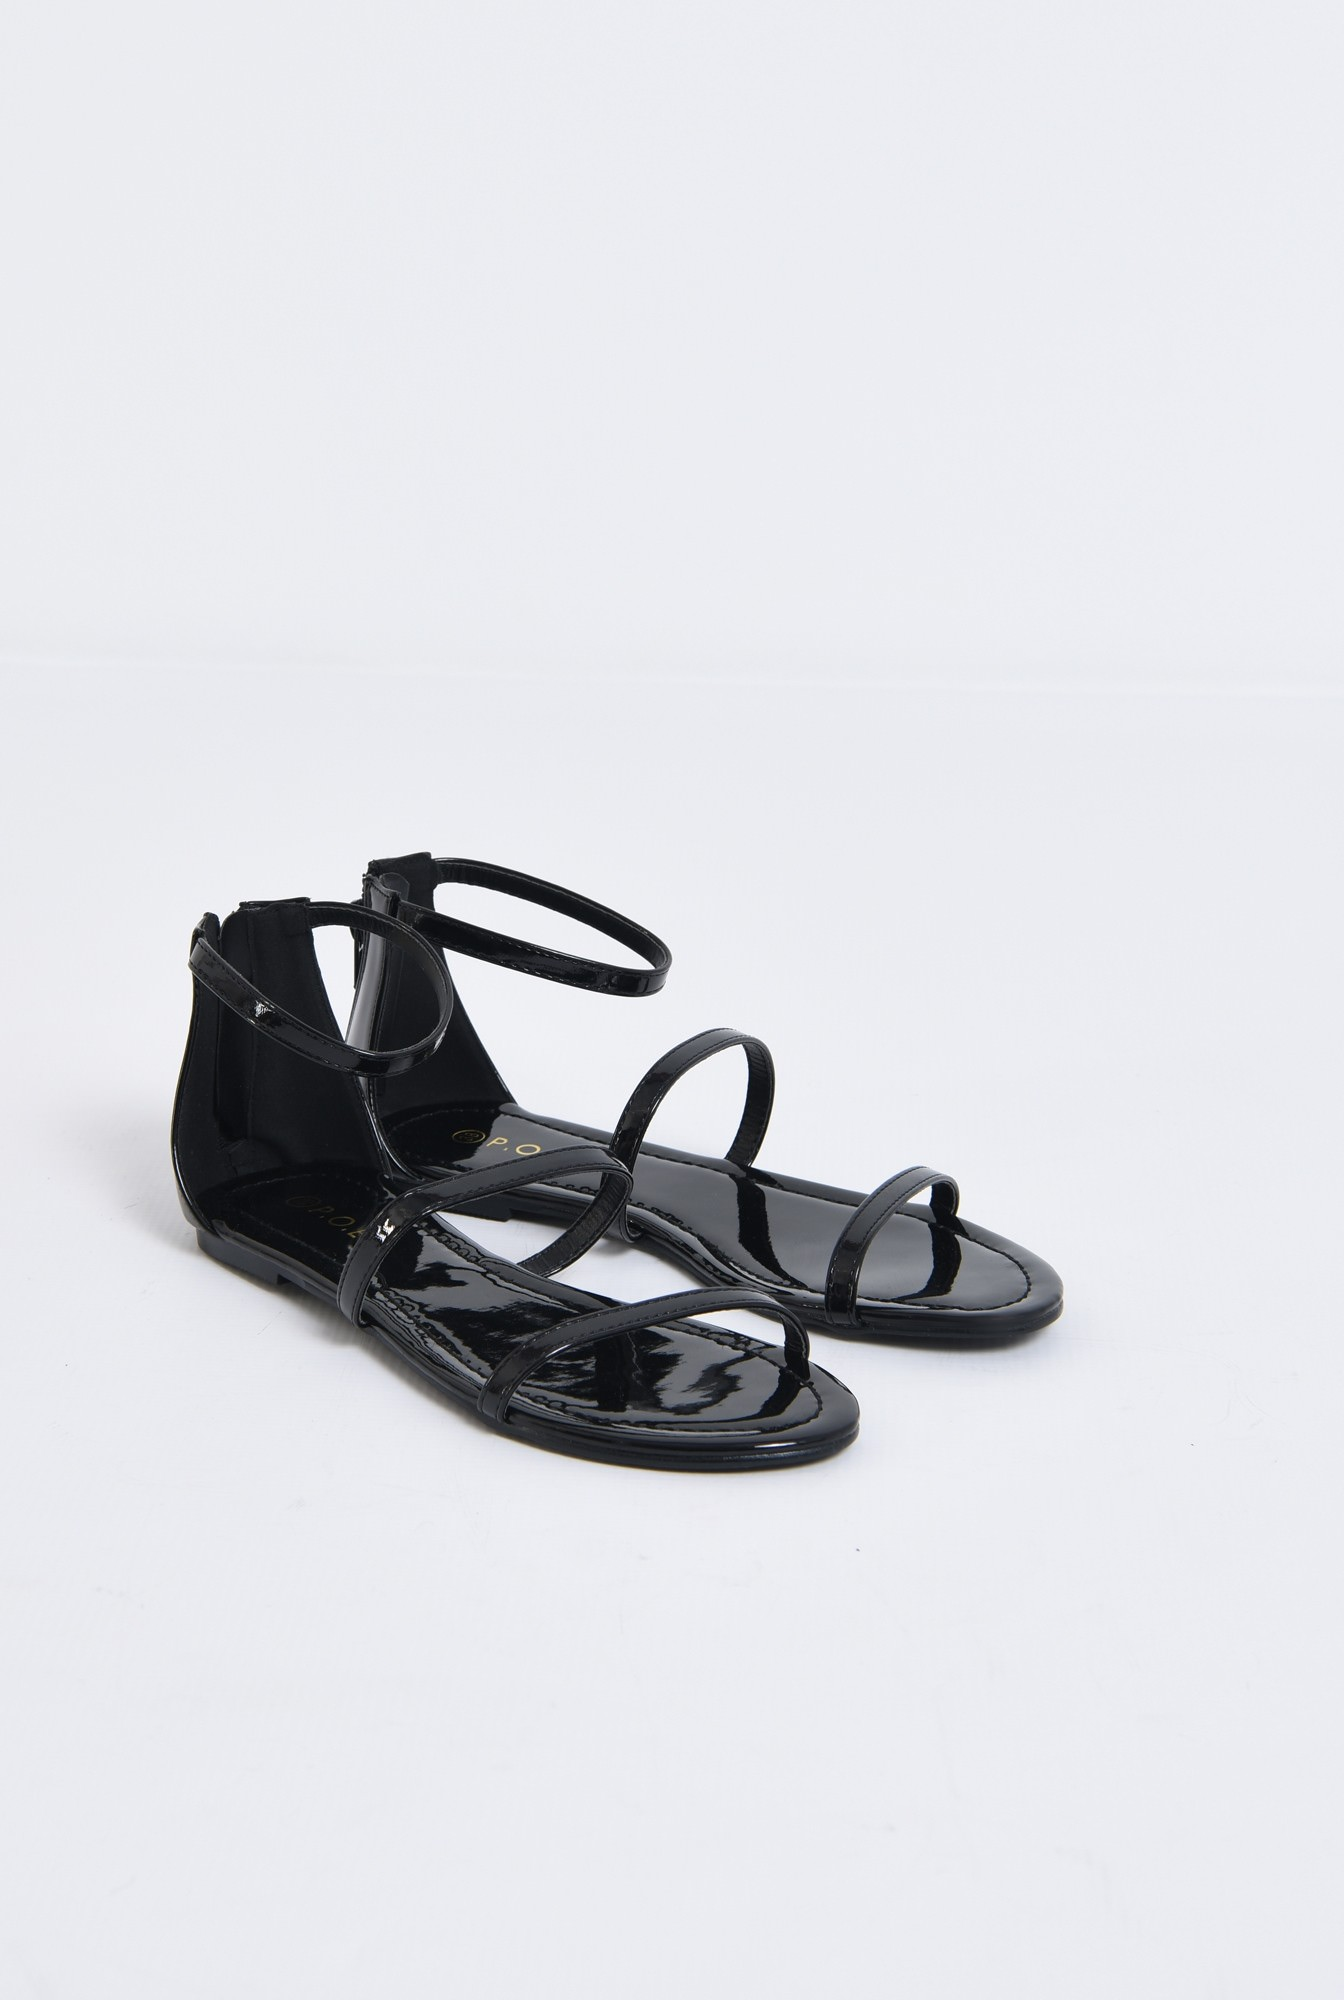 1 - sandale casual, cu talpa joasa, barete subtiri